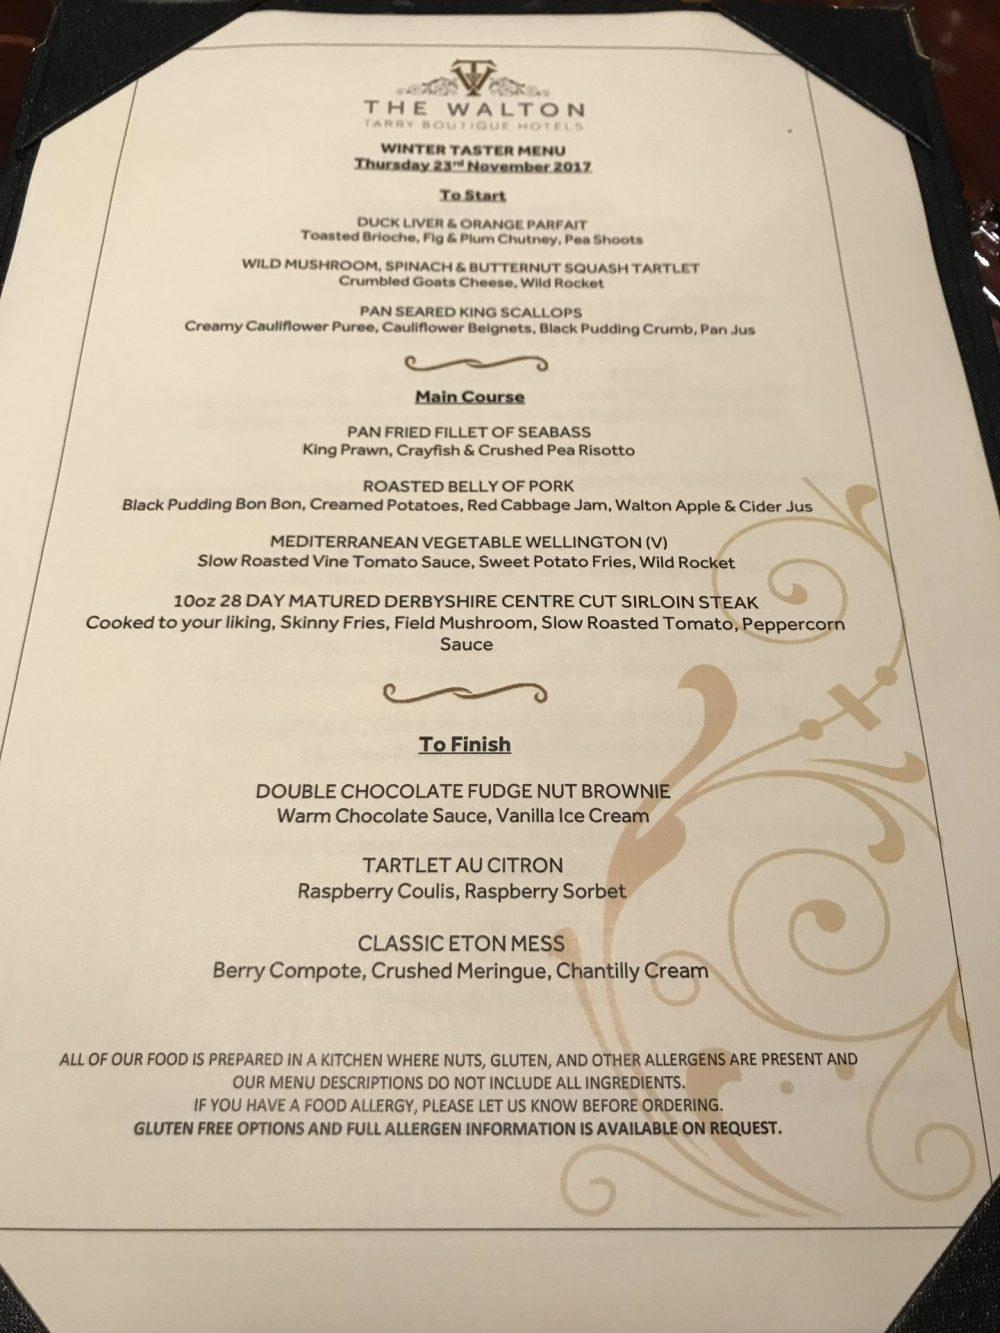 The Walton Hotel sample menu